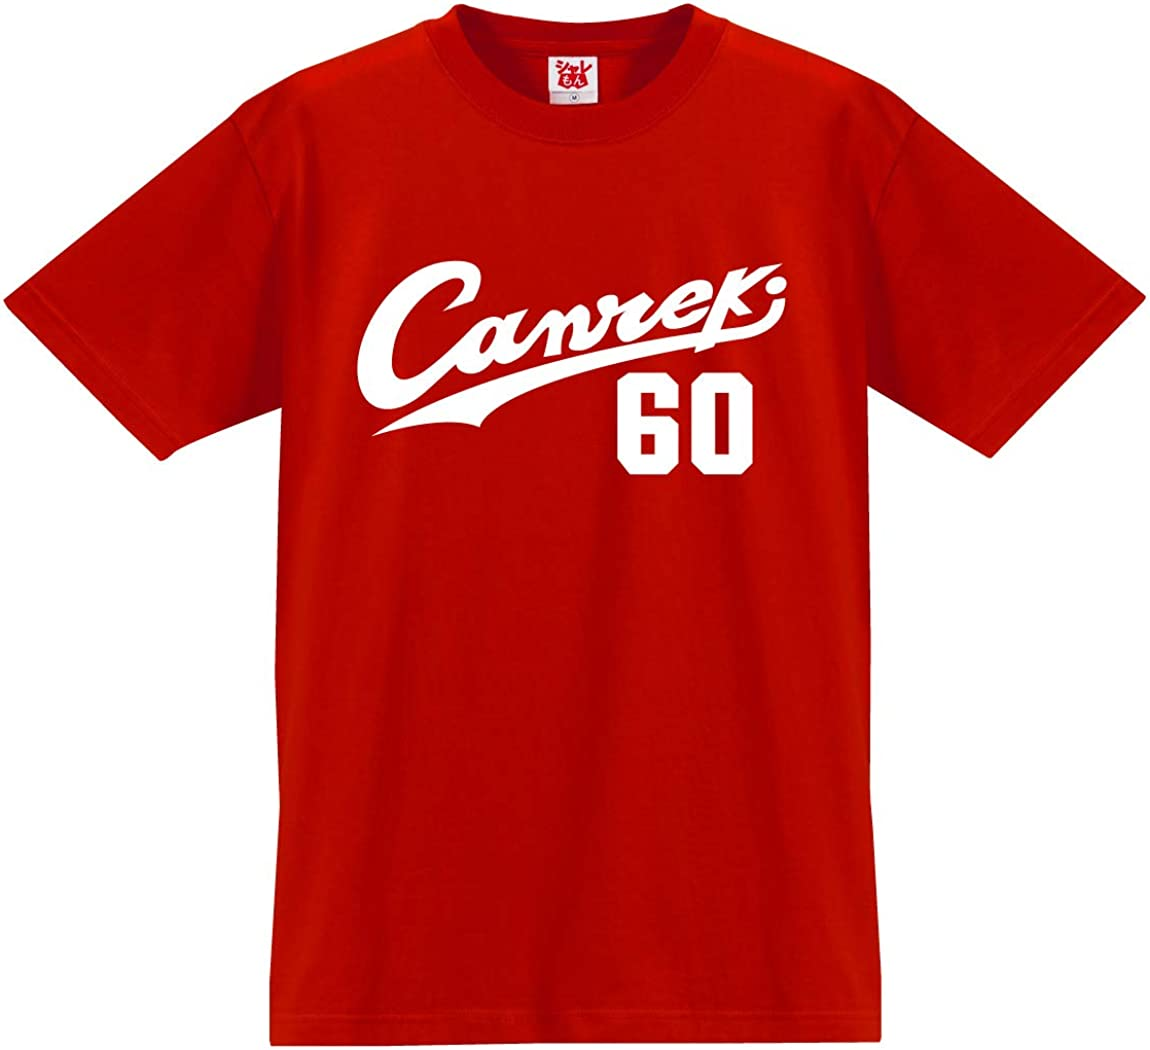 Canreki60 ユニフォーム風Tシャツ Amazon